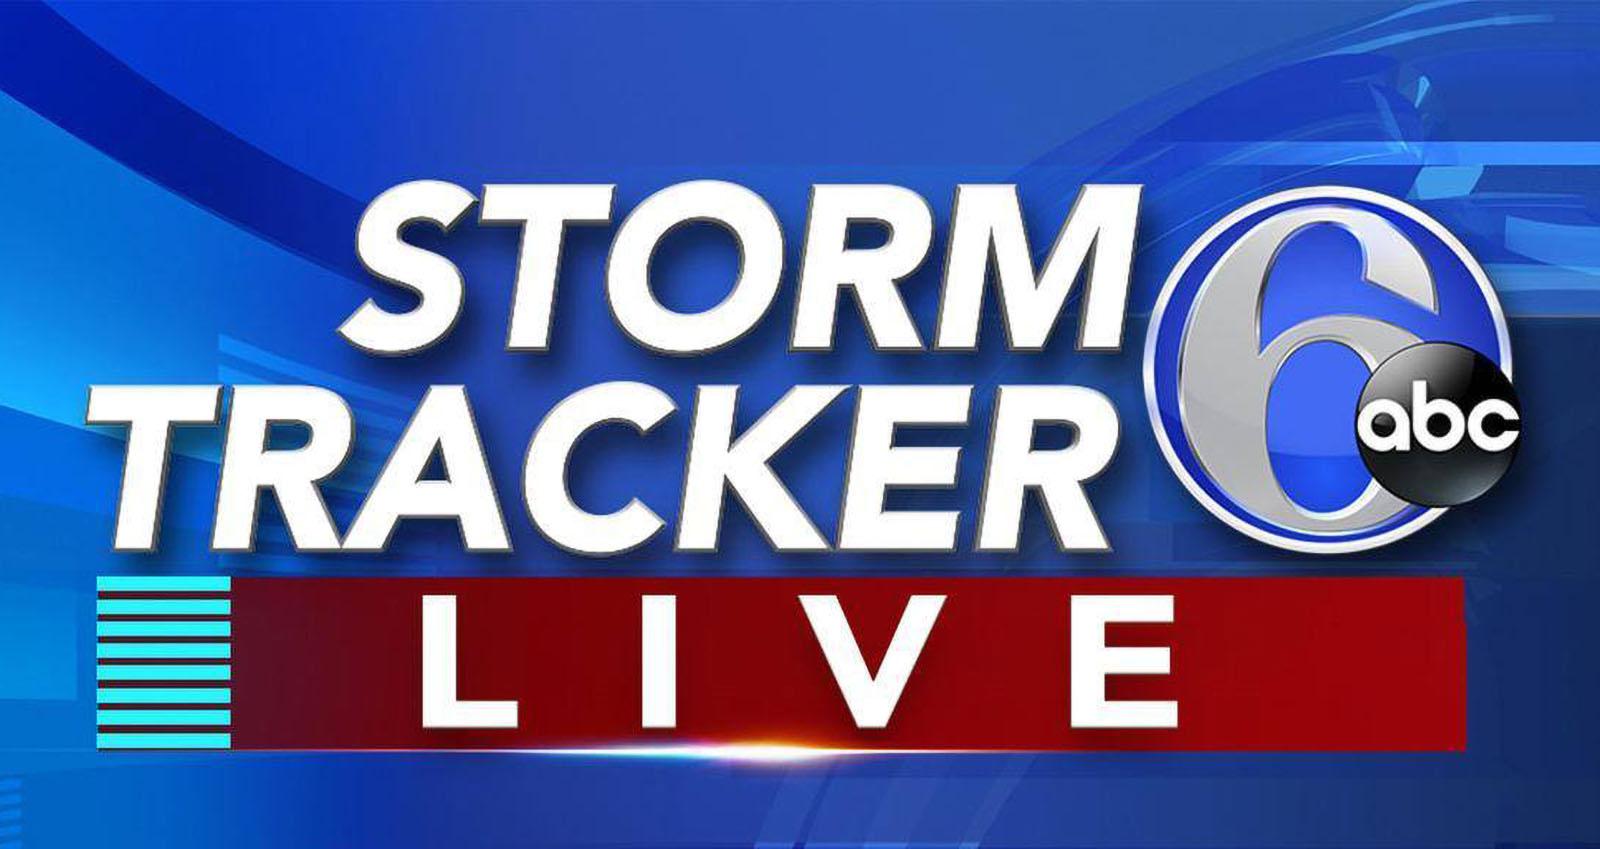 Storm Tracker Live 6abc